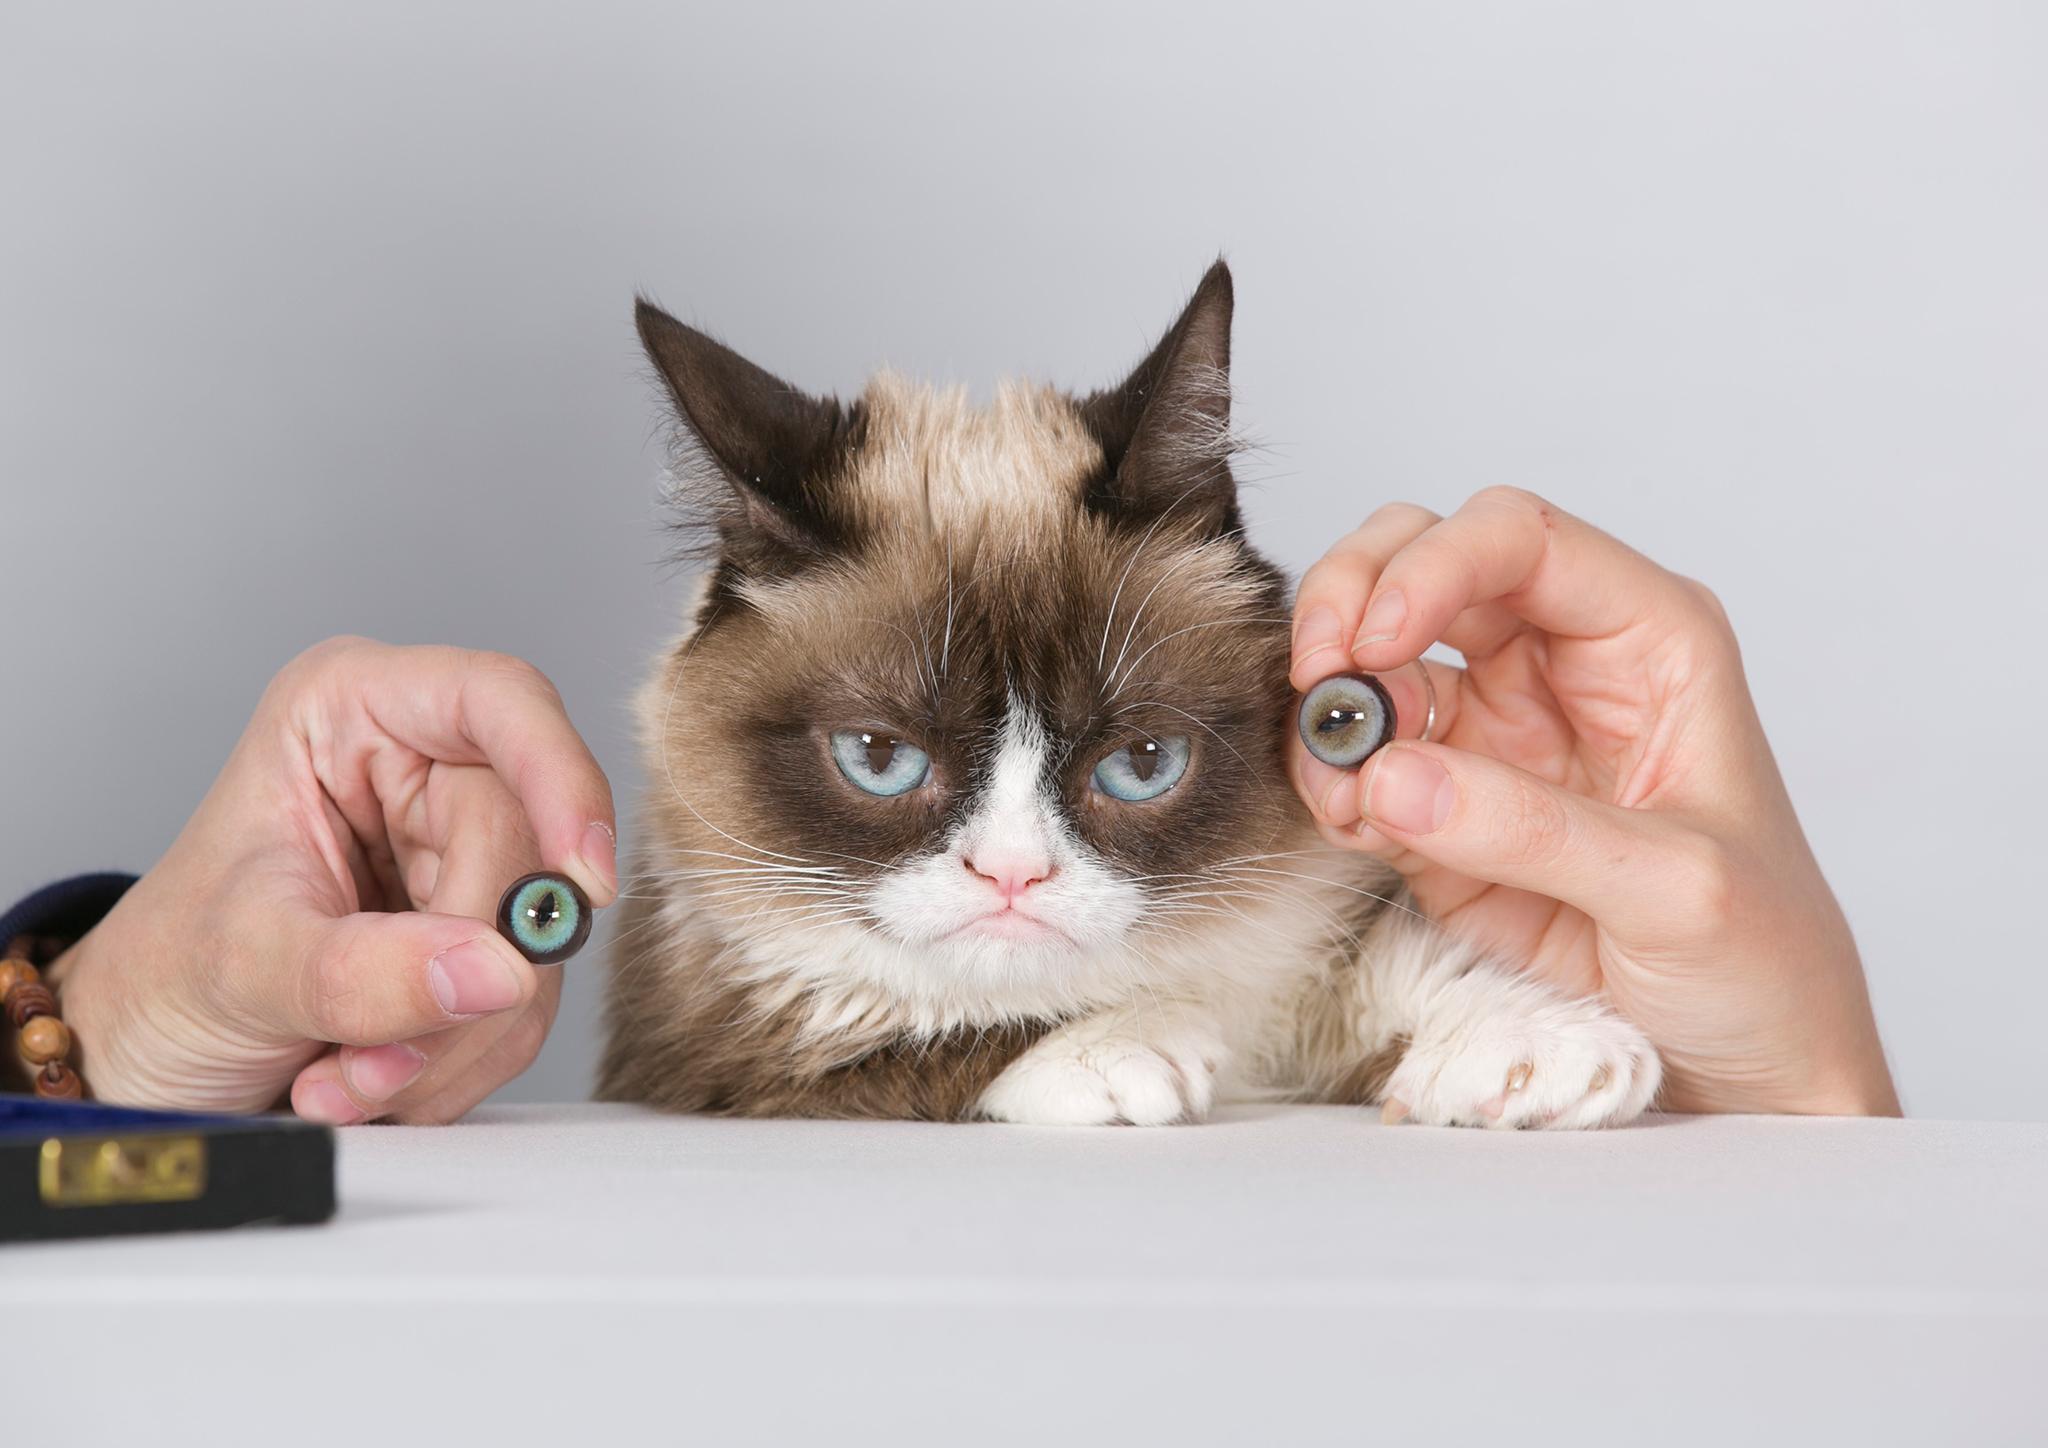 Grumpy-Cat-Sitting-MT-Touring-2015-01